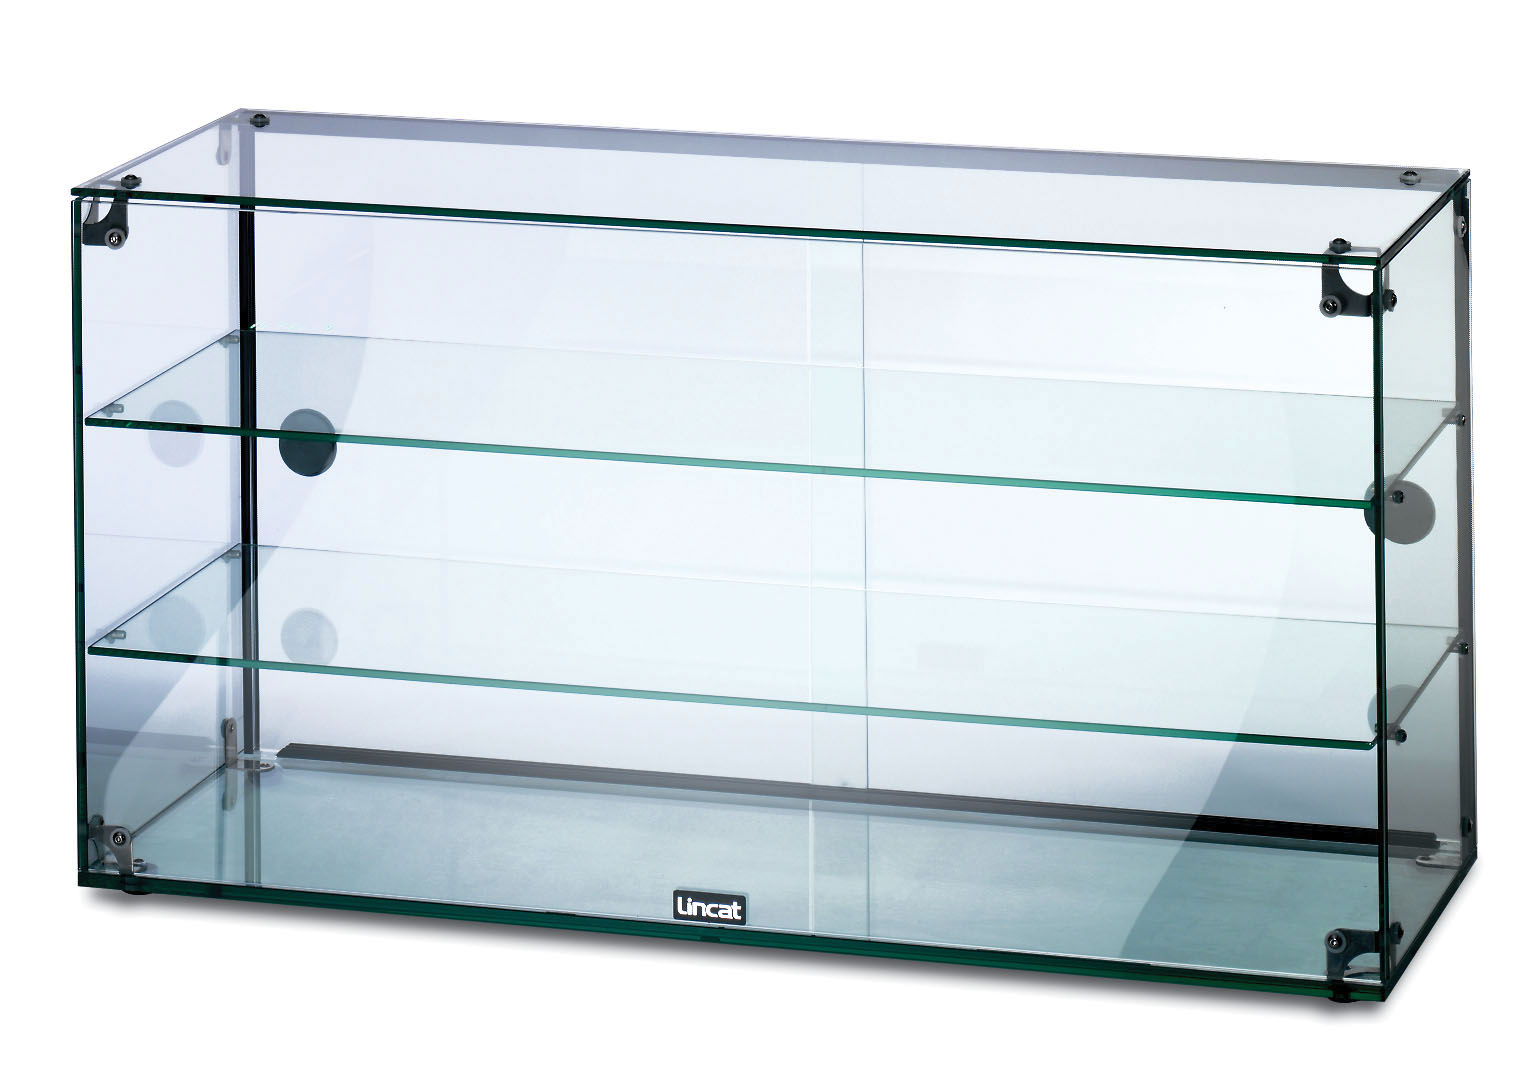 Beau Seal GC39D Glass Display Cabinet. Lincat_GC39D_Gla_4fc36e5a375e3  Lincat_GC39D_Gla_4fc36e5a375e3